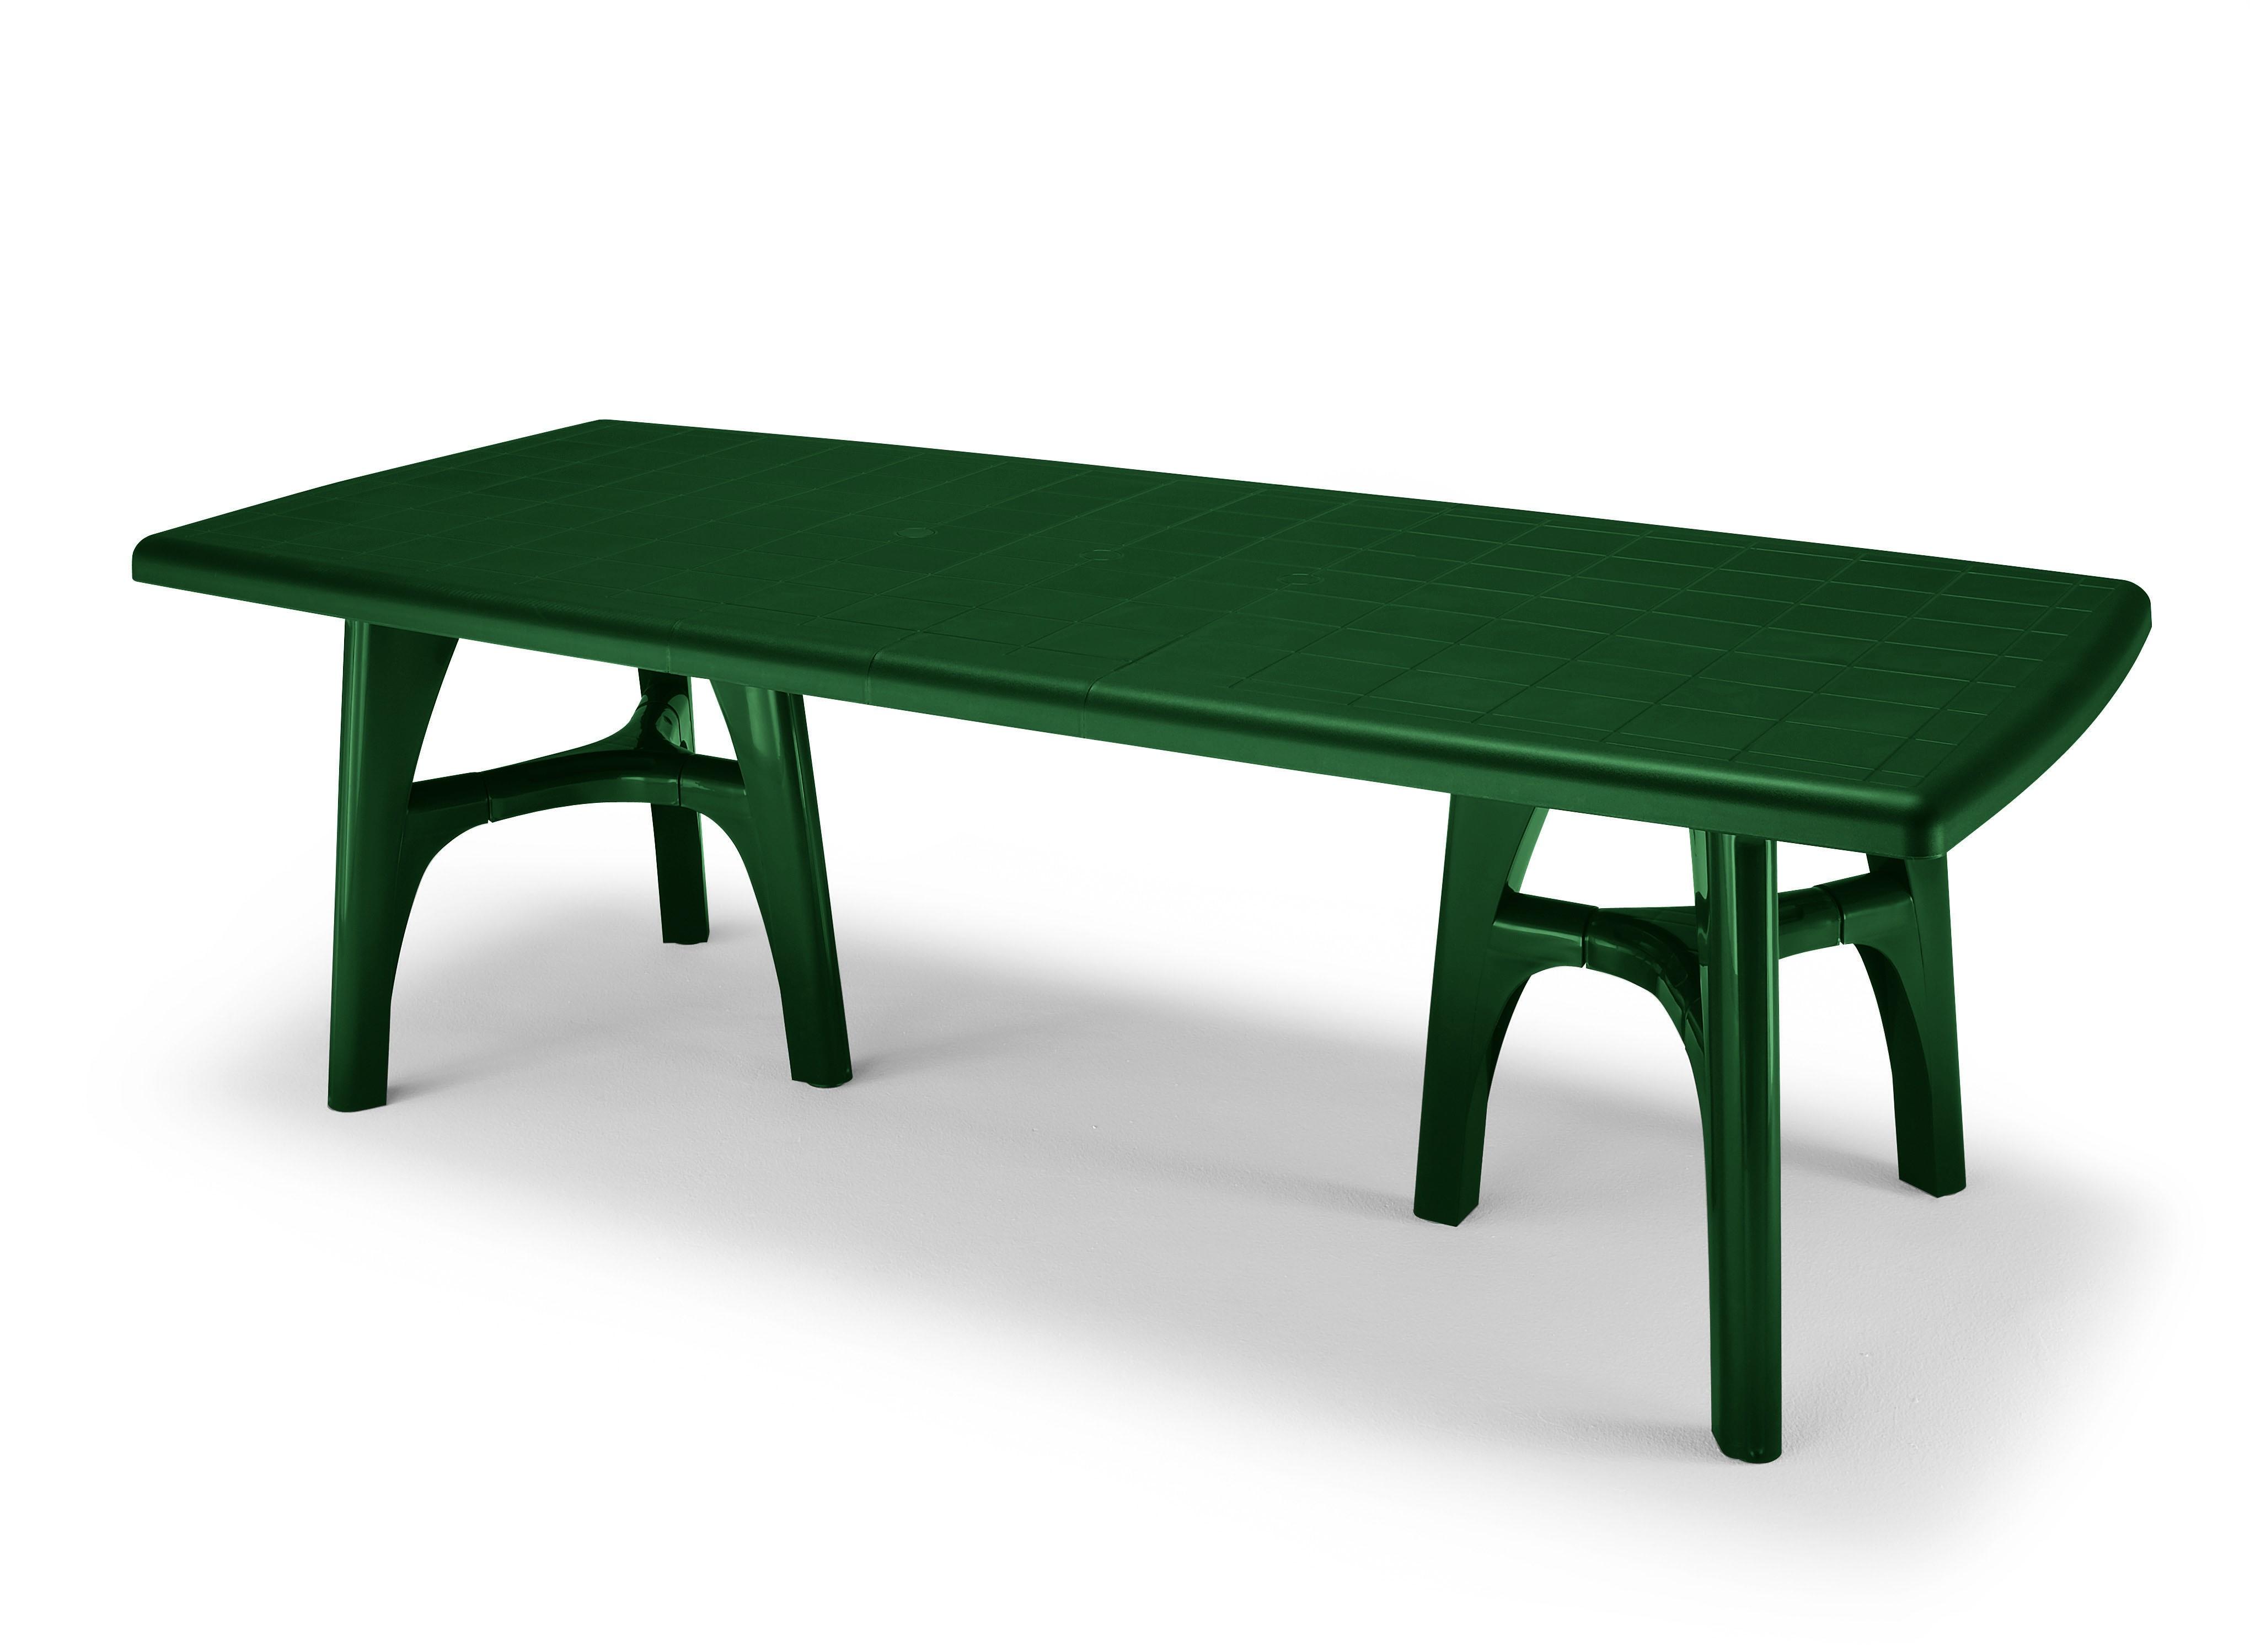 Tavoli Verde Da Giardino.Tavolo Tris Allungabile Colore Verde Bosco Lamacchia Mobili